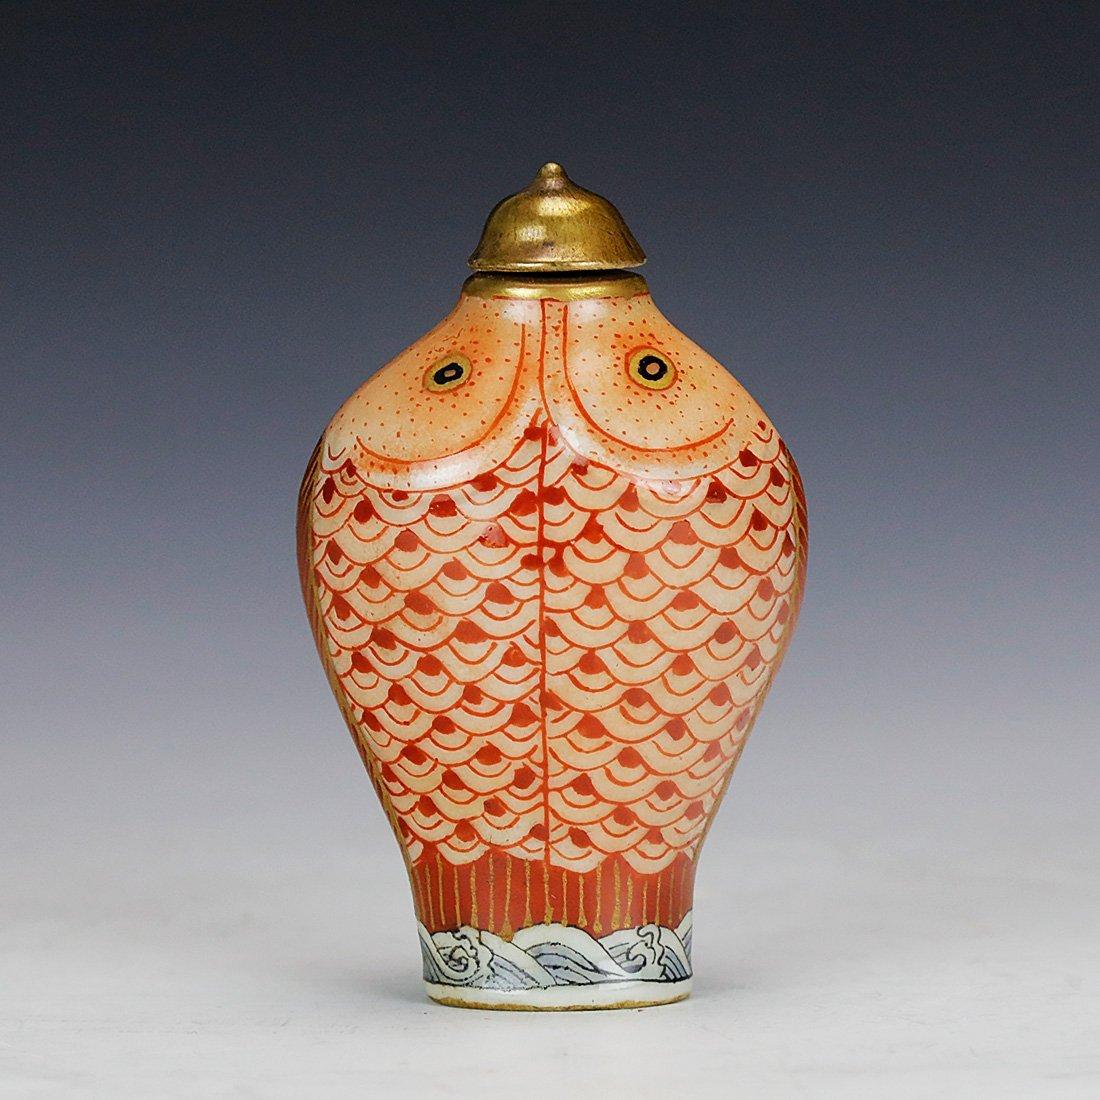 Qianlong ceramic snuff box Hand painted gold 18 century - 3